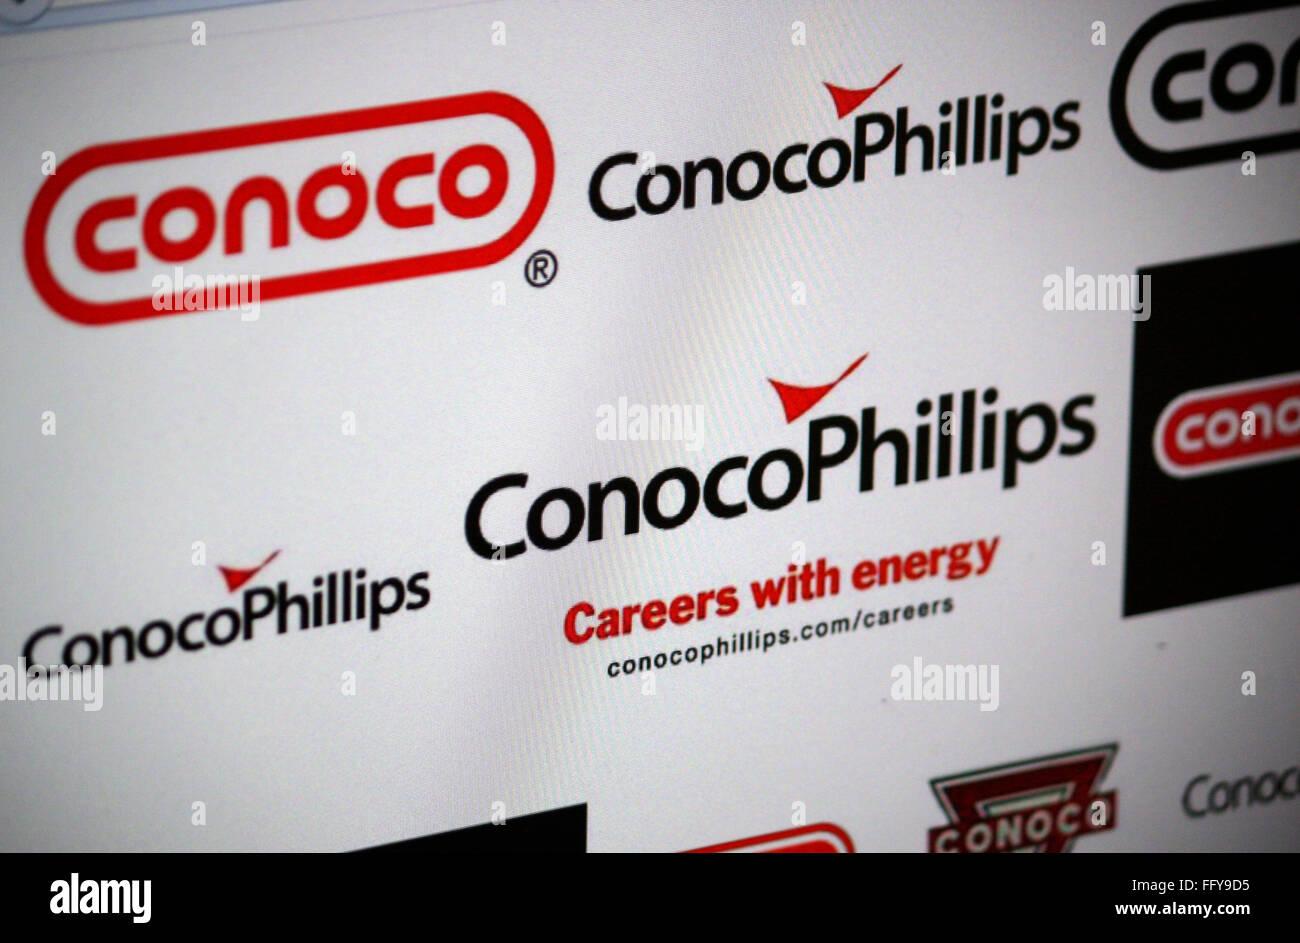 Conoco Stock Photos & Conoco Stock Images - Alamy